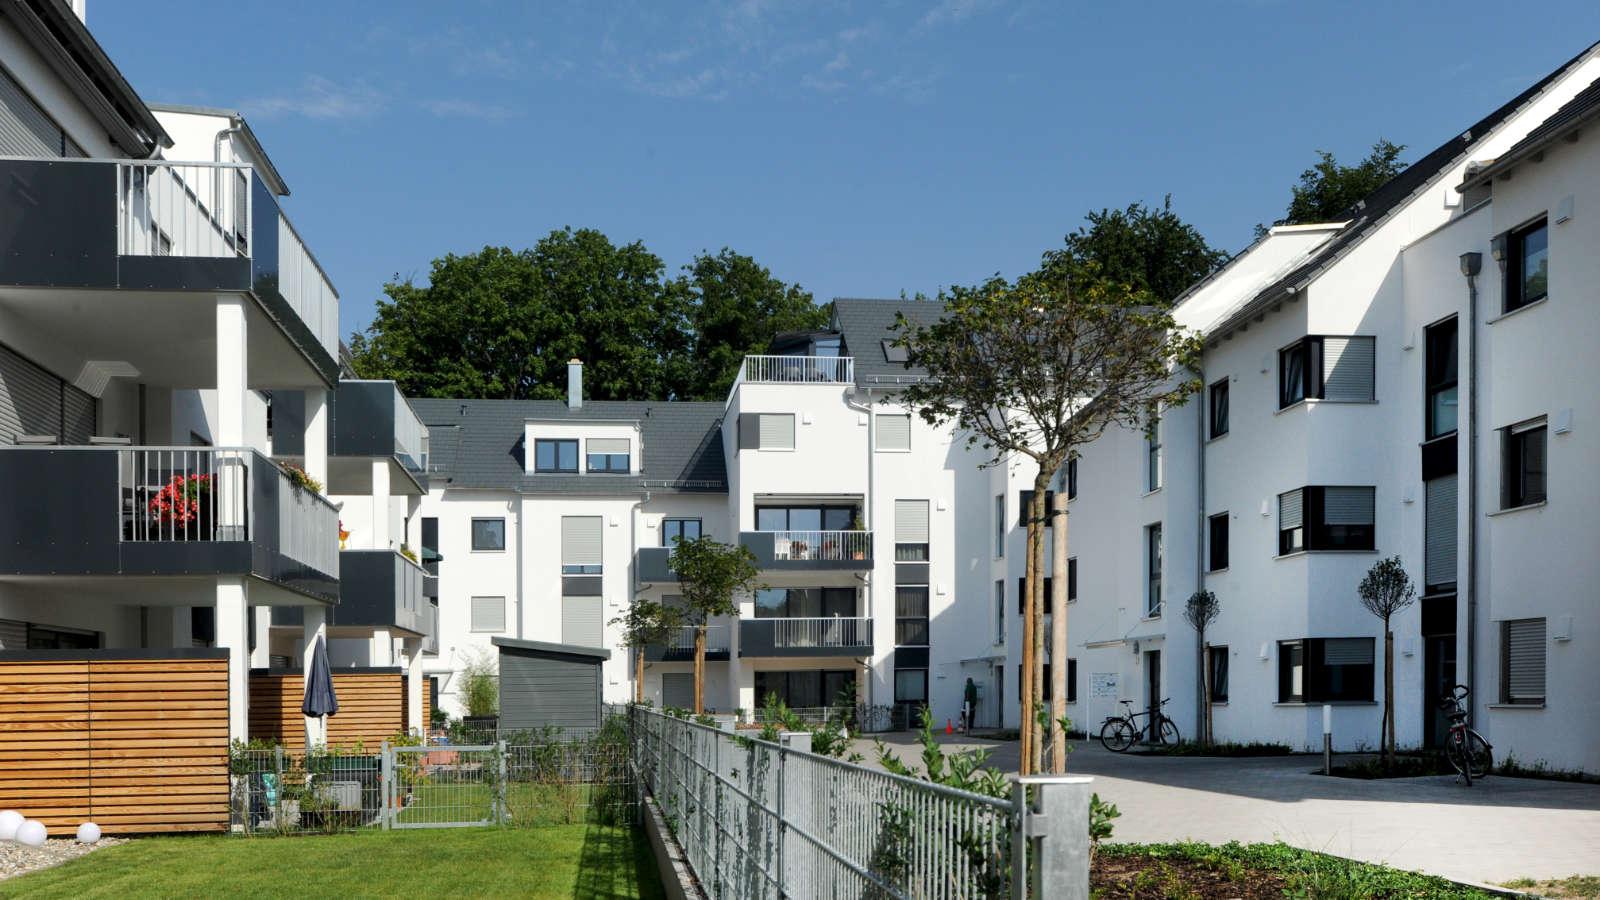 Wilhelm-Friedrich-Weg | Innenhof